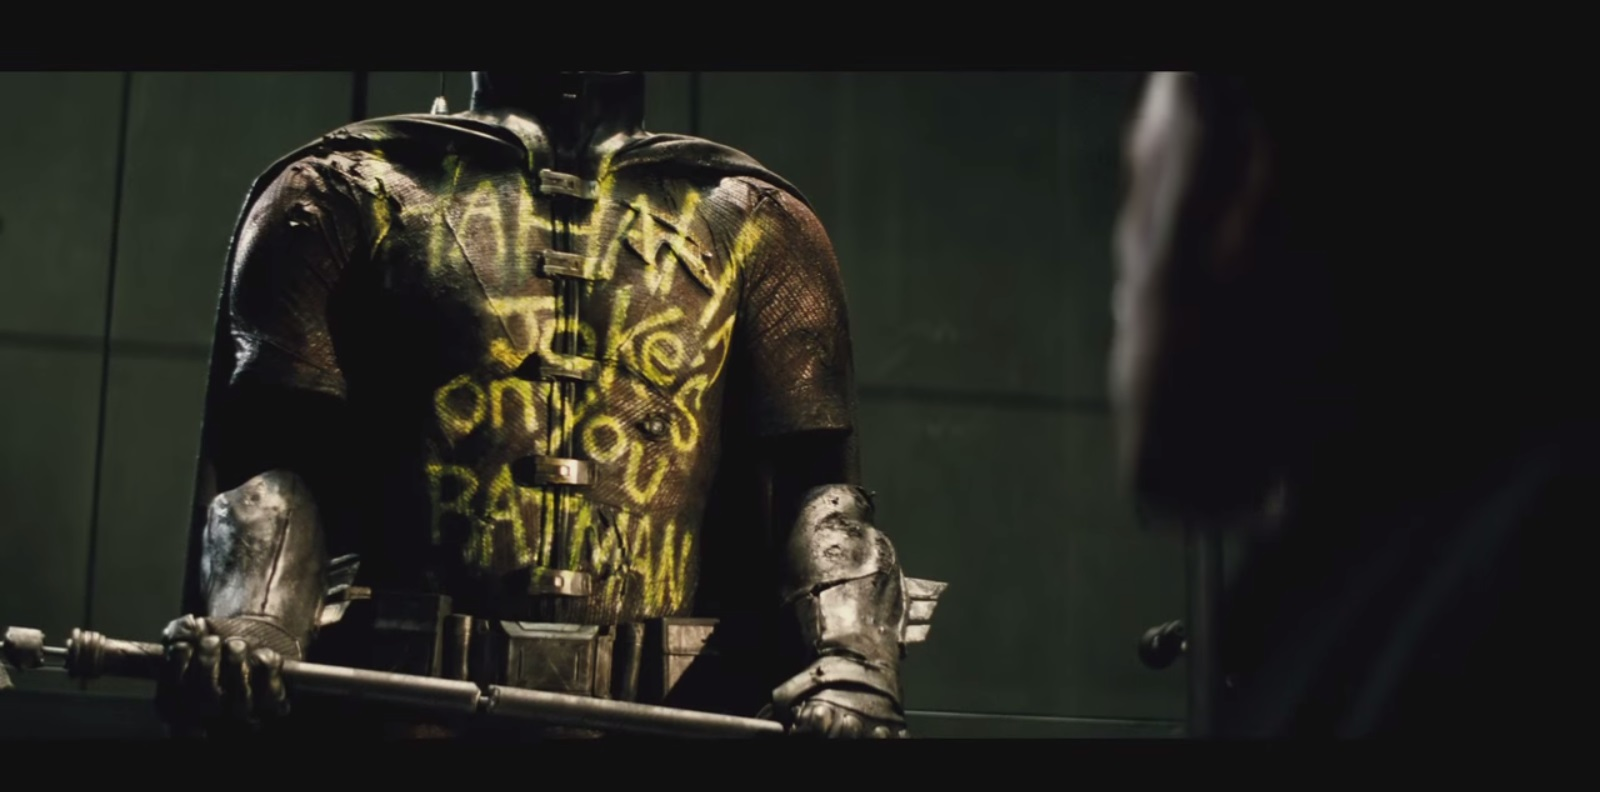 CACP - #373 - Robin's Dead?